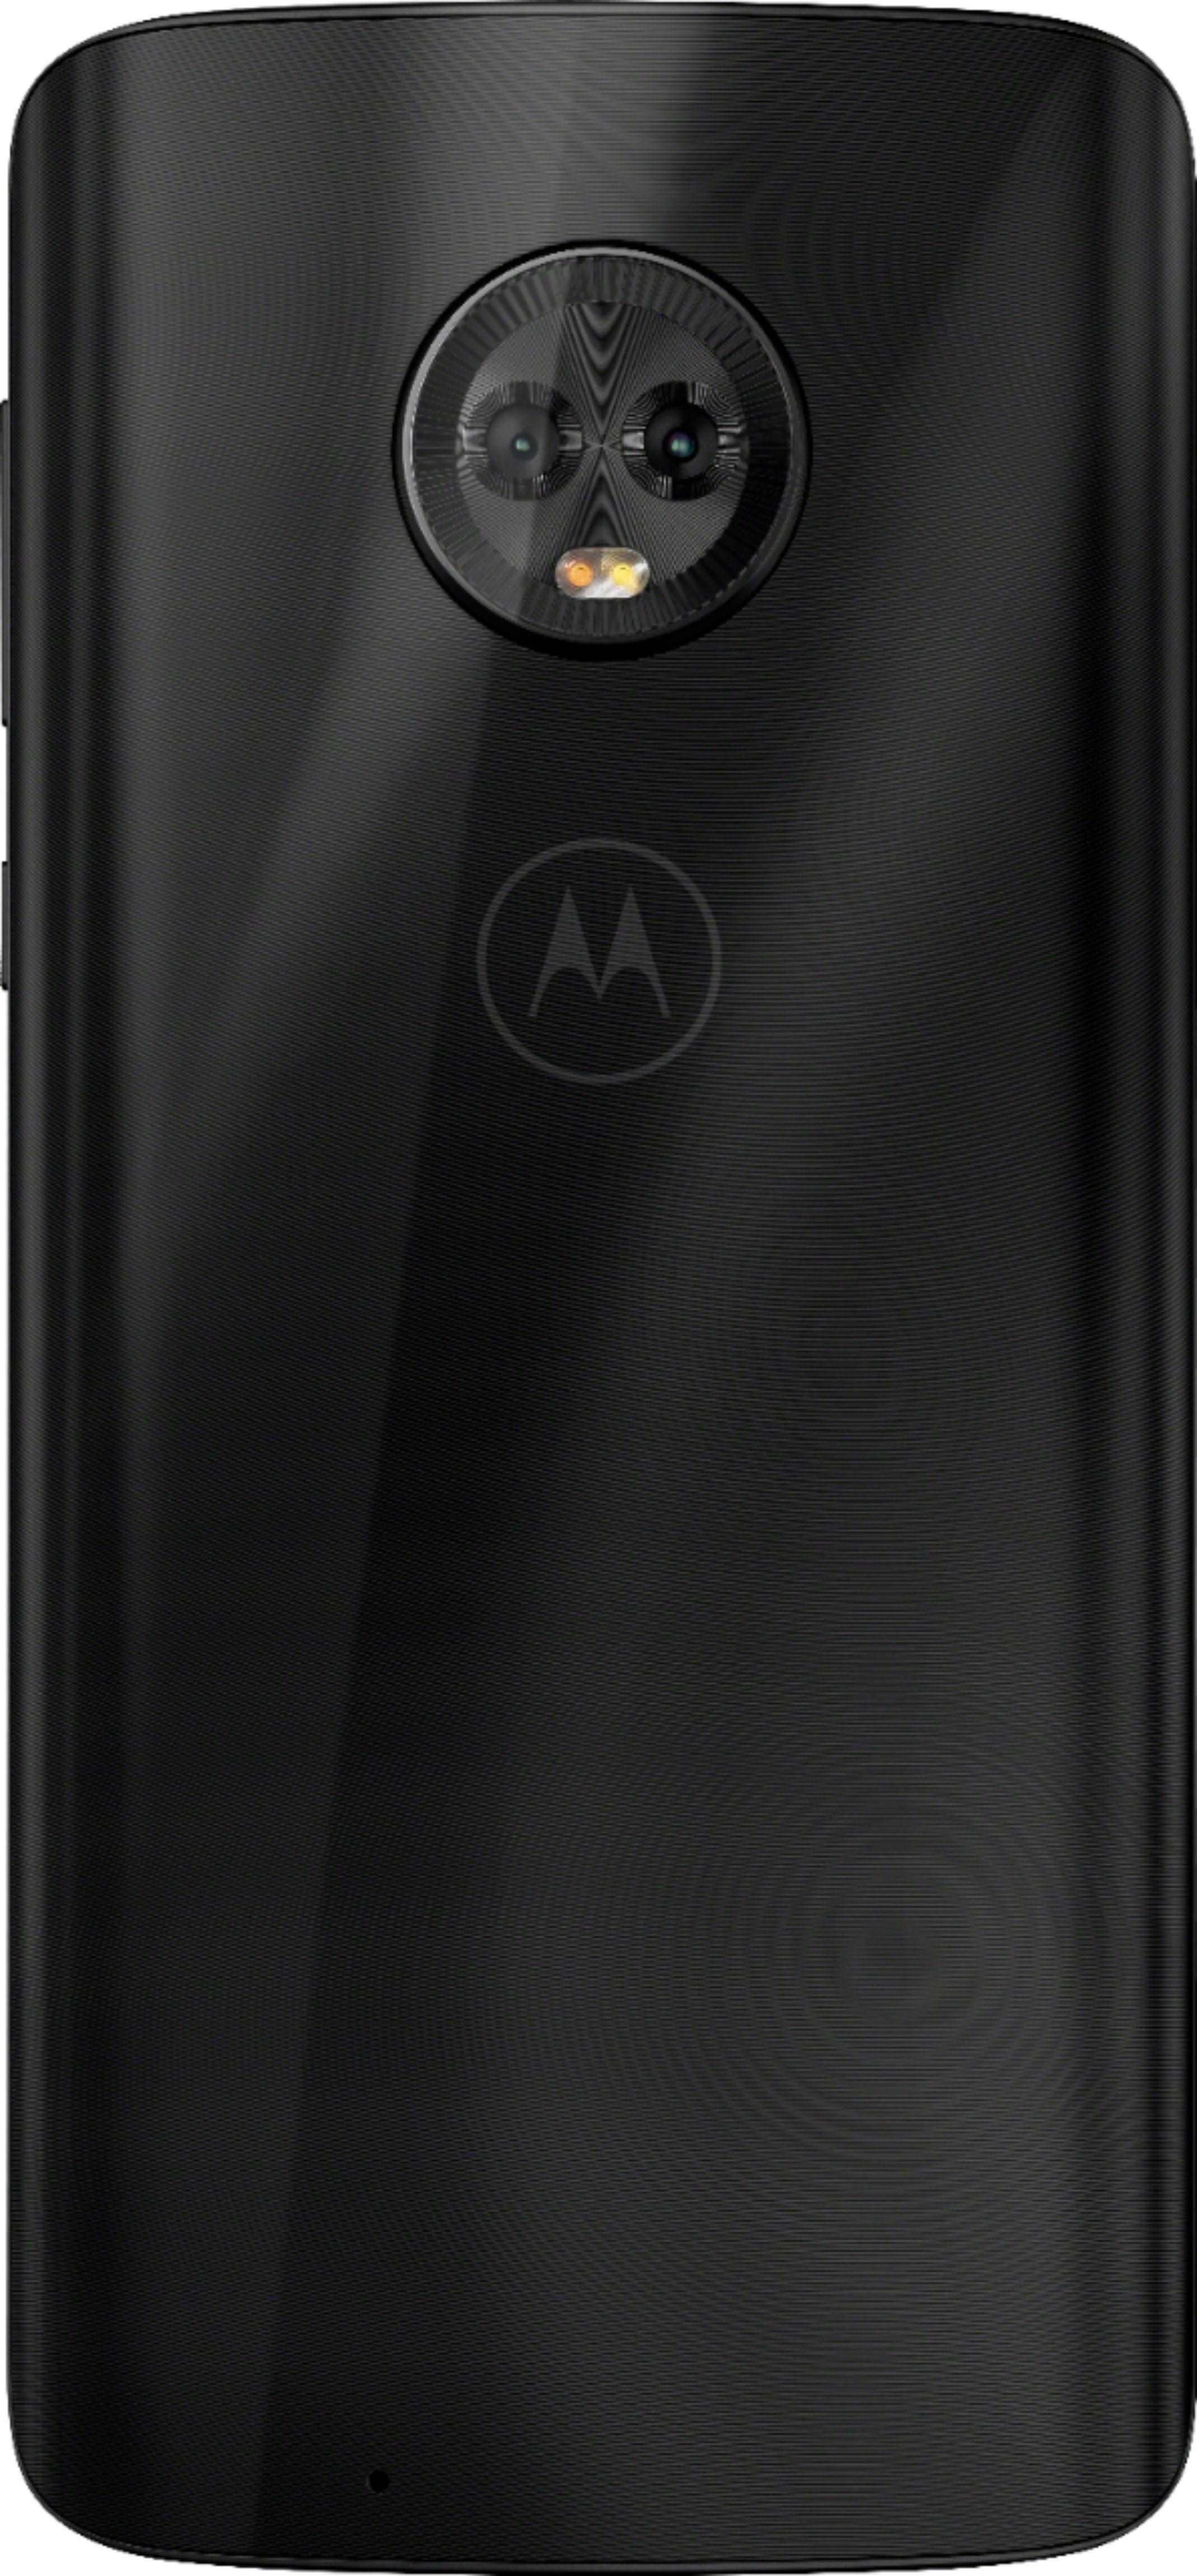 White Memory Cell Phone Black Buy Nashua Open Box Buy Nashua Nh Number Memory Cell Phone Black Buy Motorola Moto Motorola Moto houzz-02 Best Buy Nashua